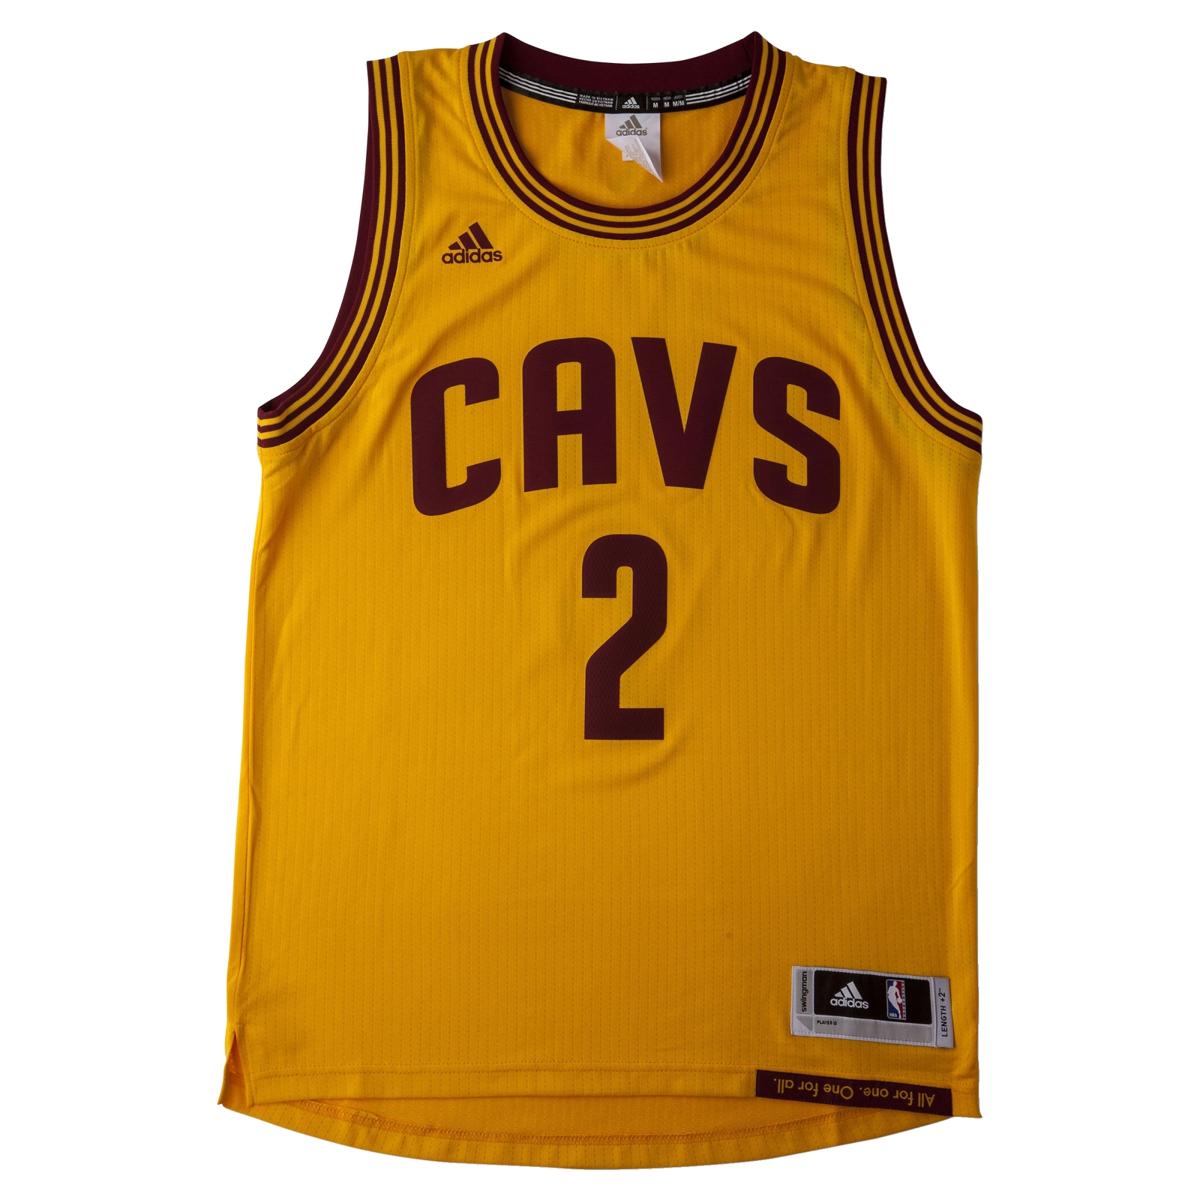 Adidas NBA Cleveland Cavaliers Swingman 2 Kyrie Irving Jersey - A45826 . a23b90134